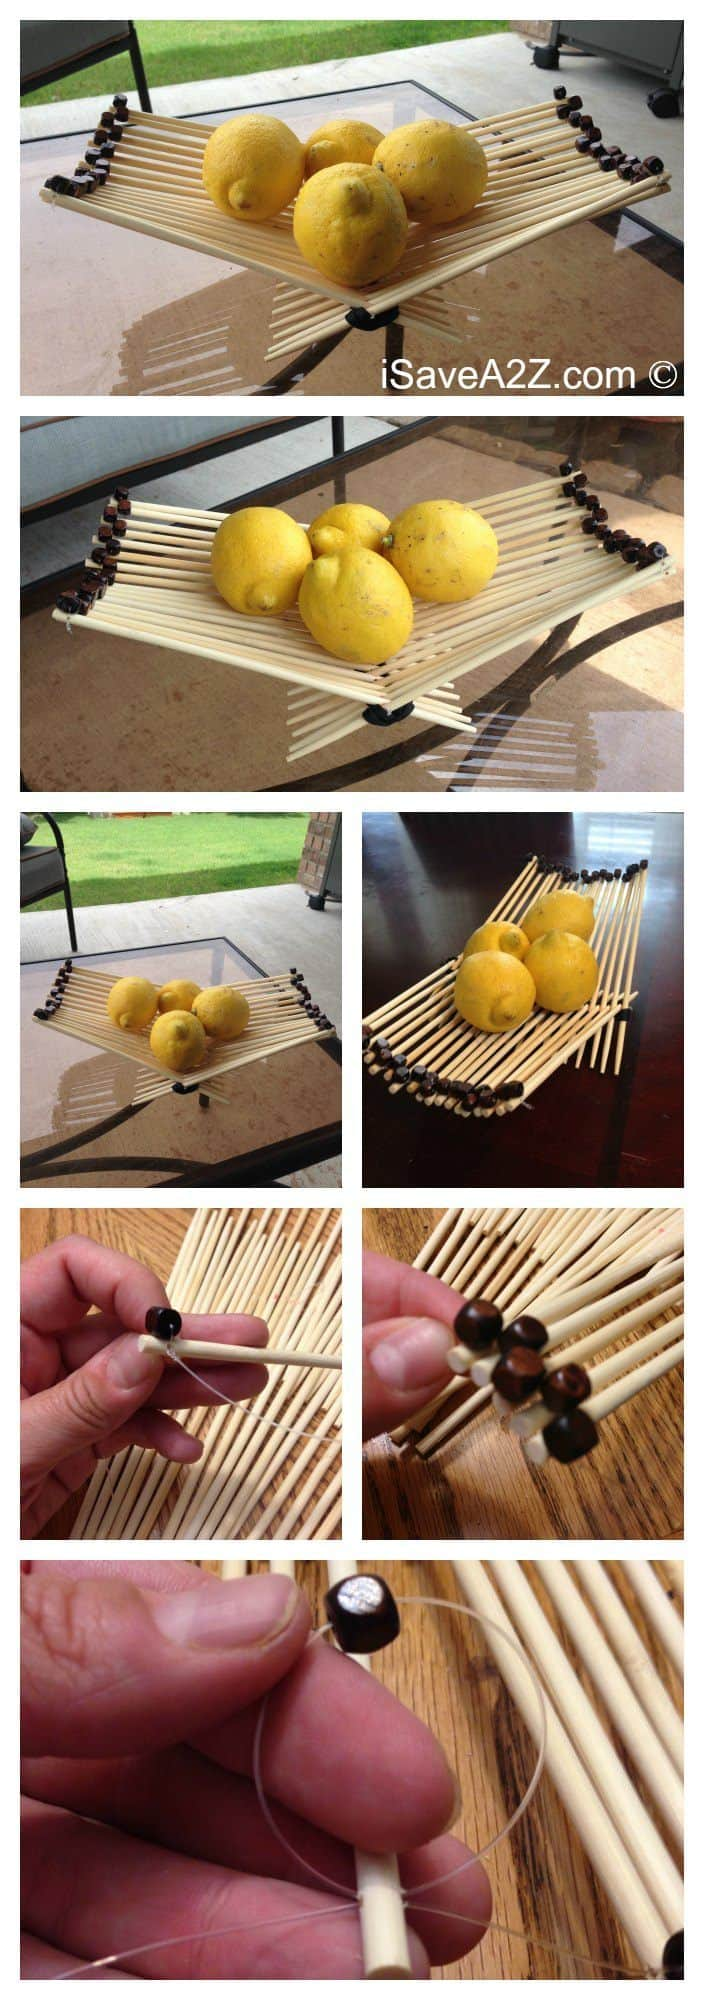 How to Make a Chopsticks Basket with a decorative edge